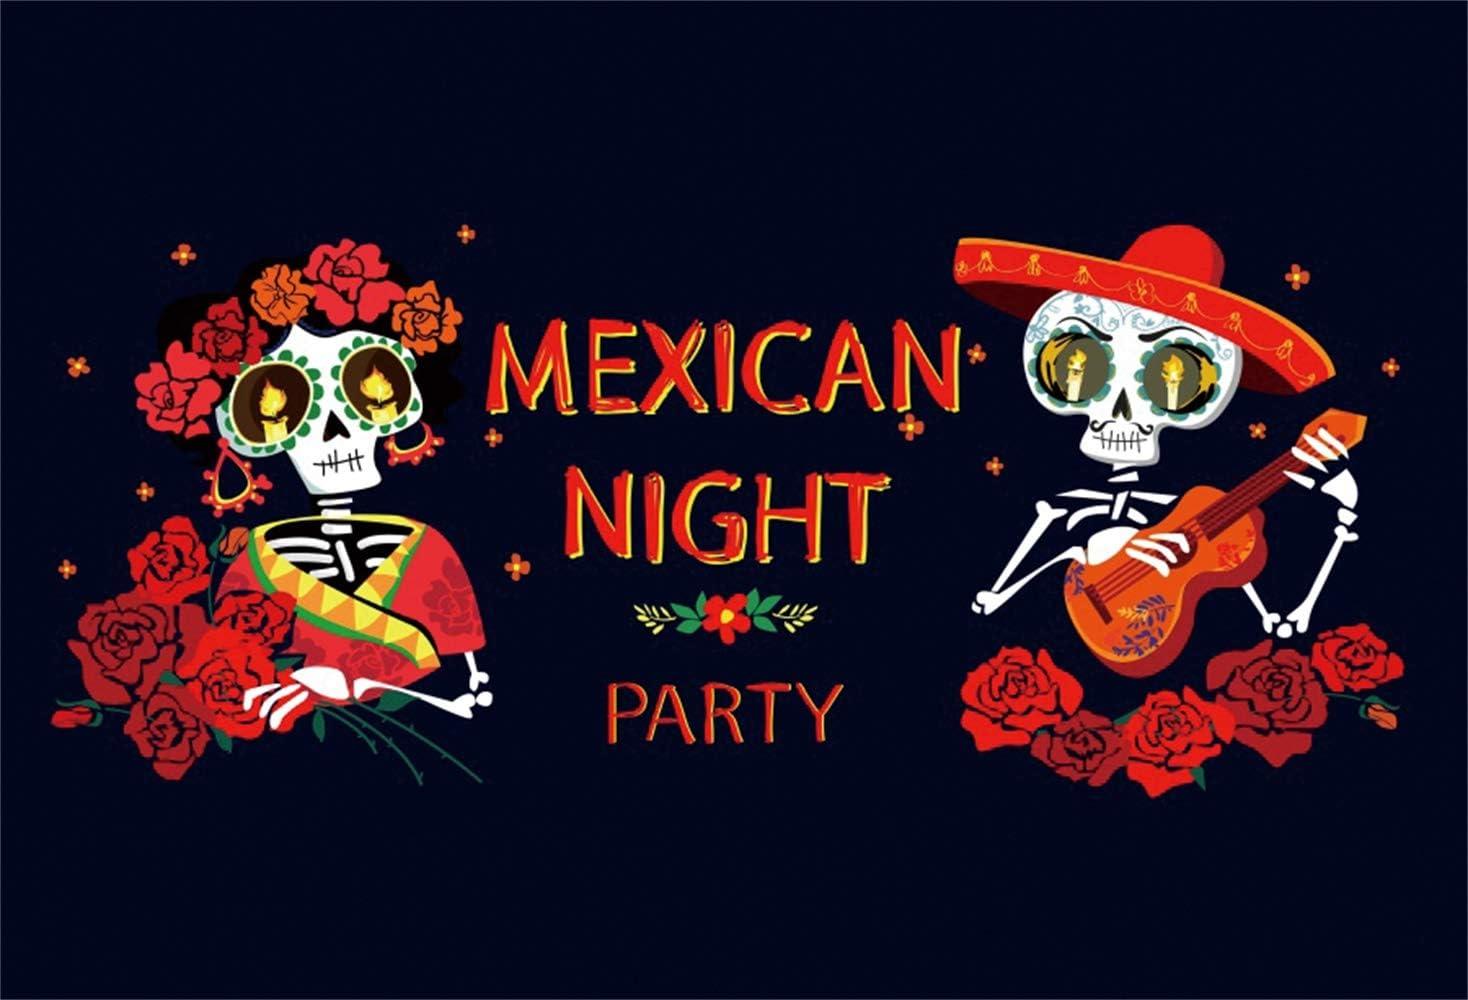 Leowefowa 15x8ft Day of The Dead Backdrop Dia De Los Muertos Photography Background Cartoon Orgiastic Dancing Mexican Skeletons Skulls Flowers Illustration Fiesta Carnival Party Banner Wallpaper